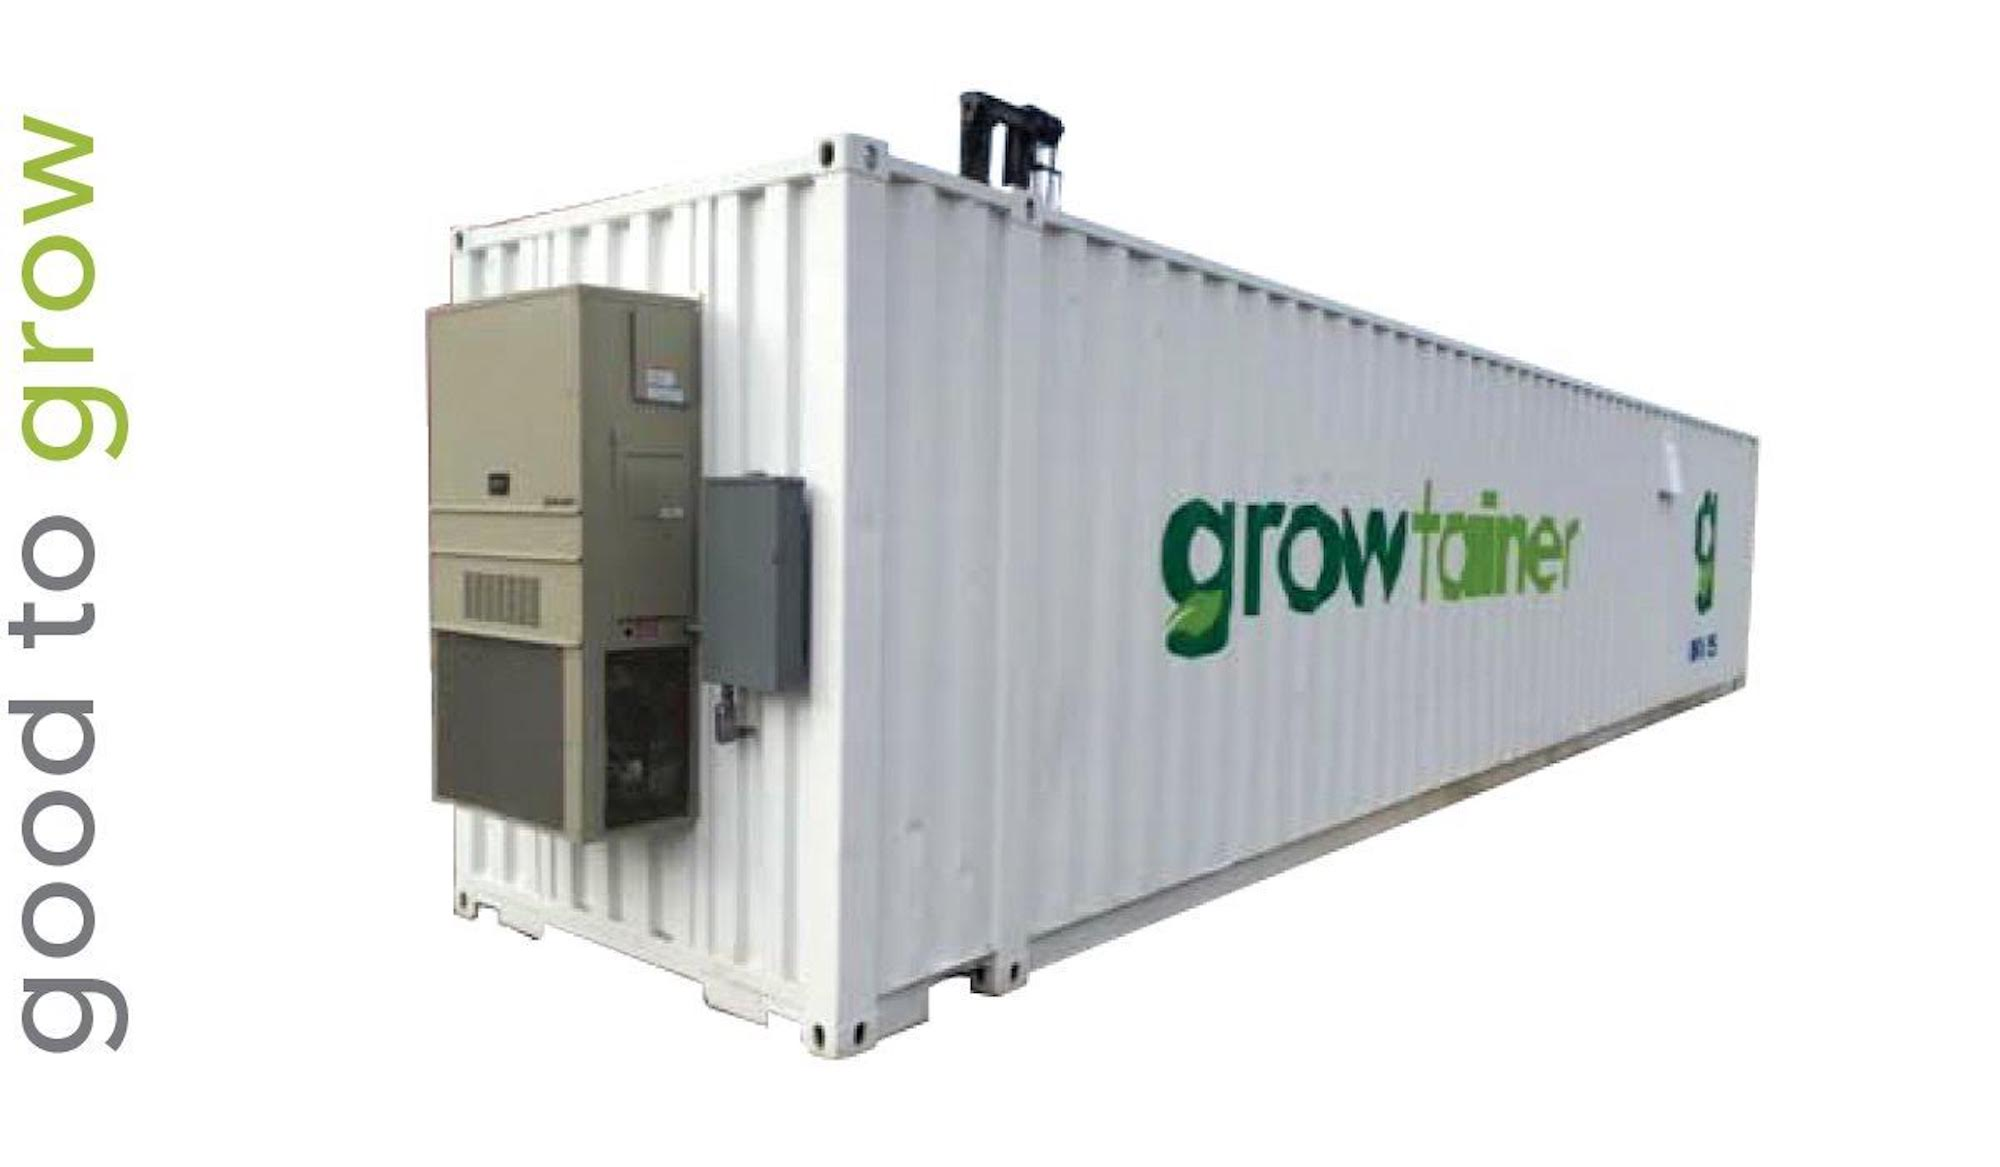 growtainer.jpg